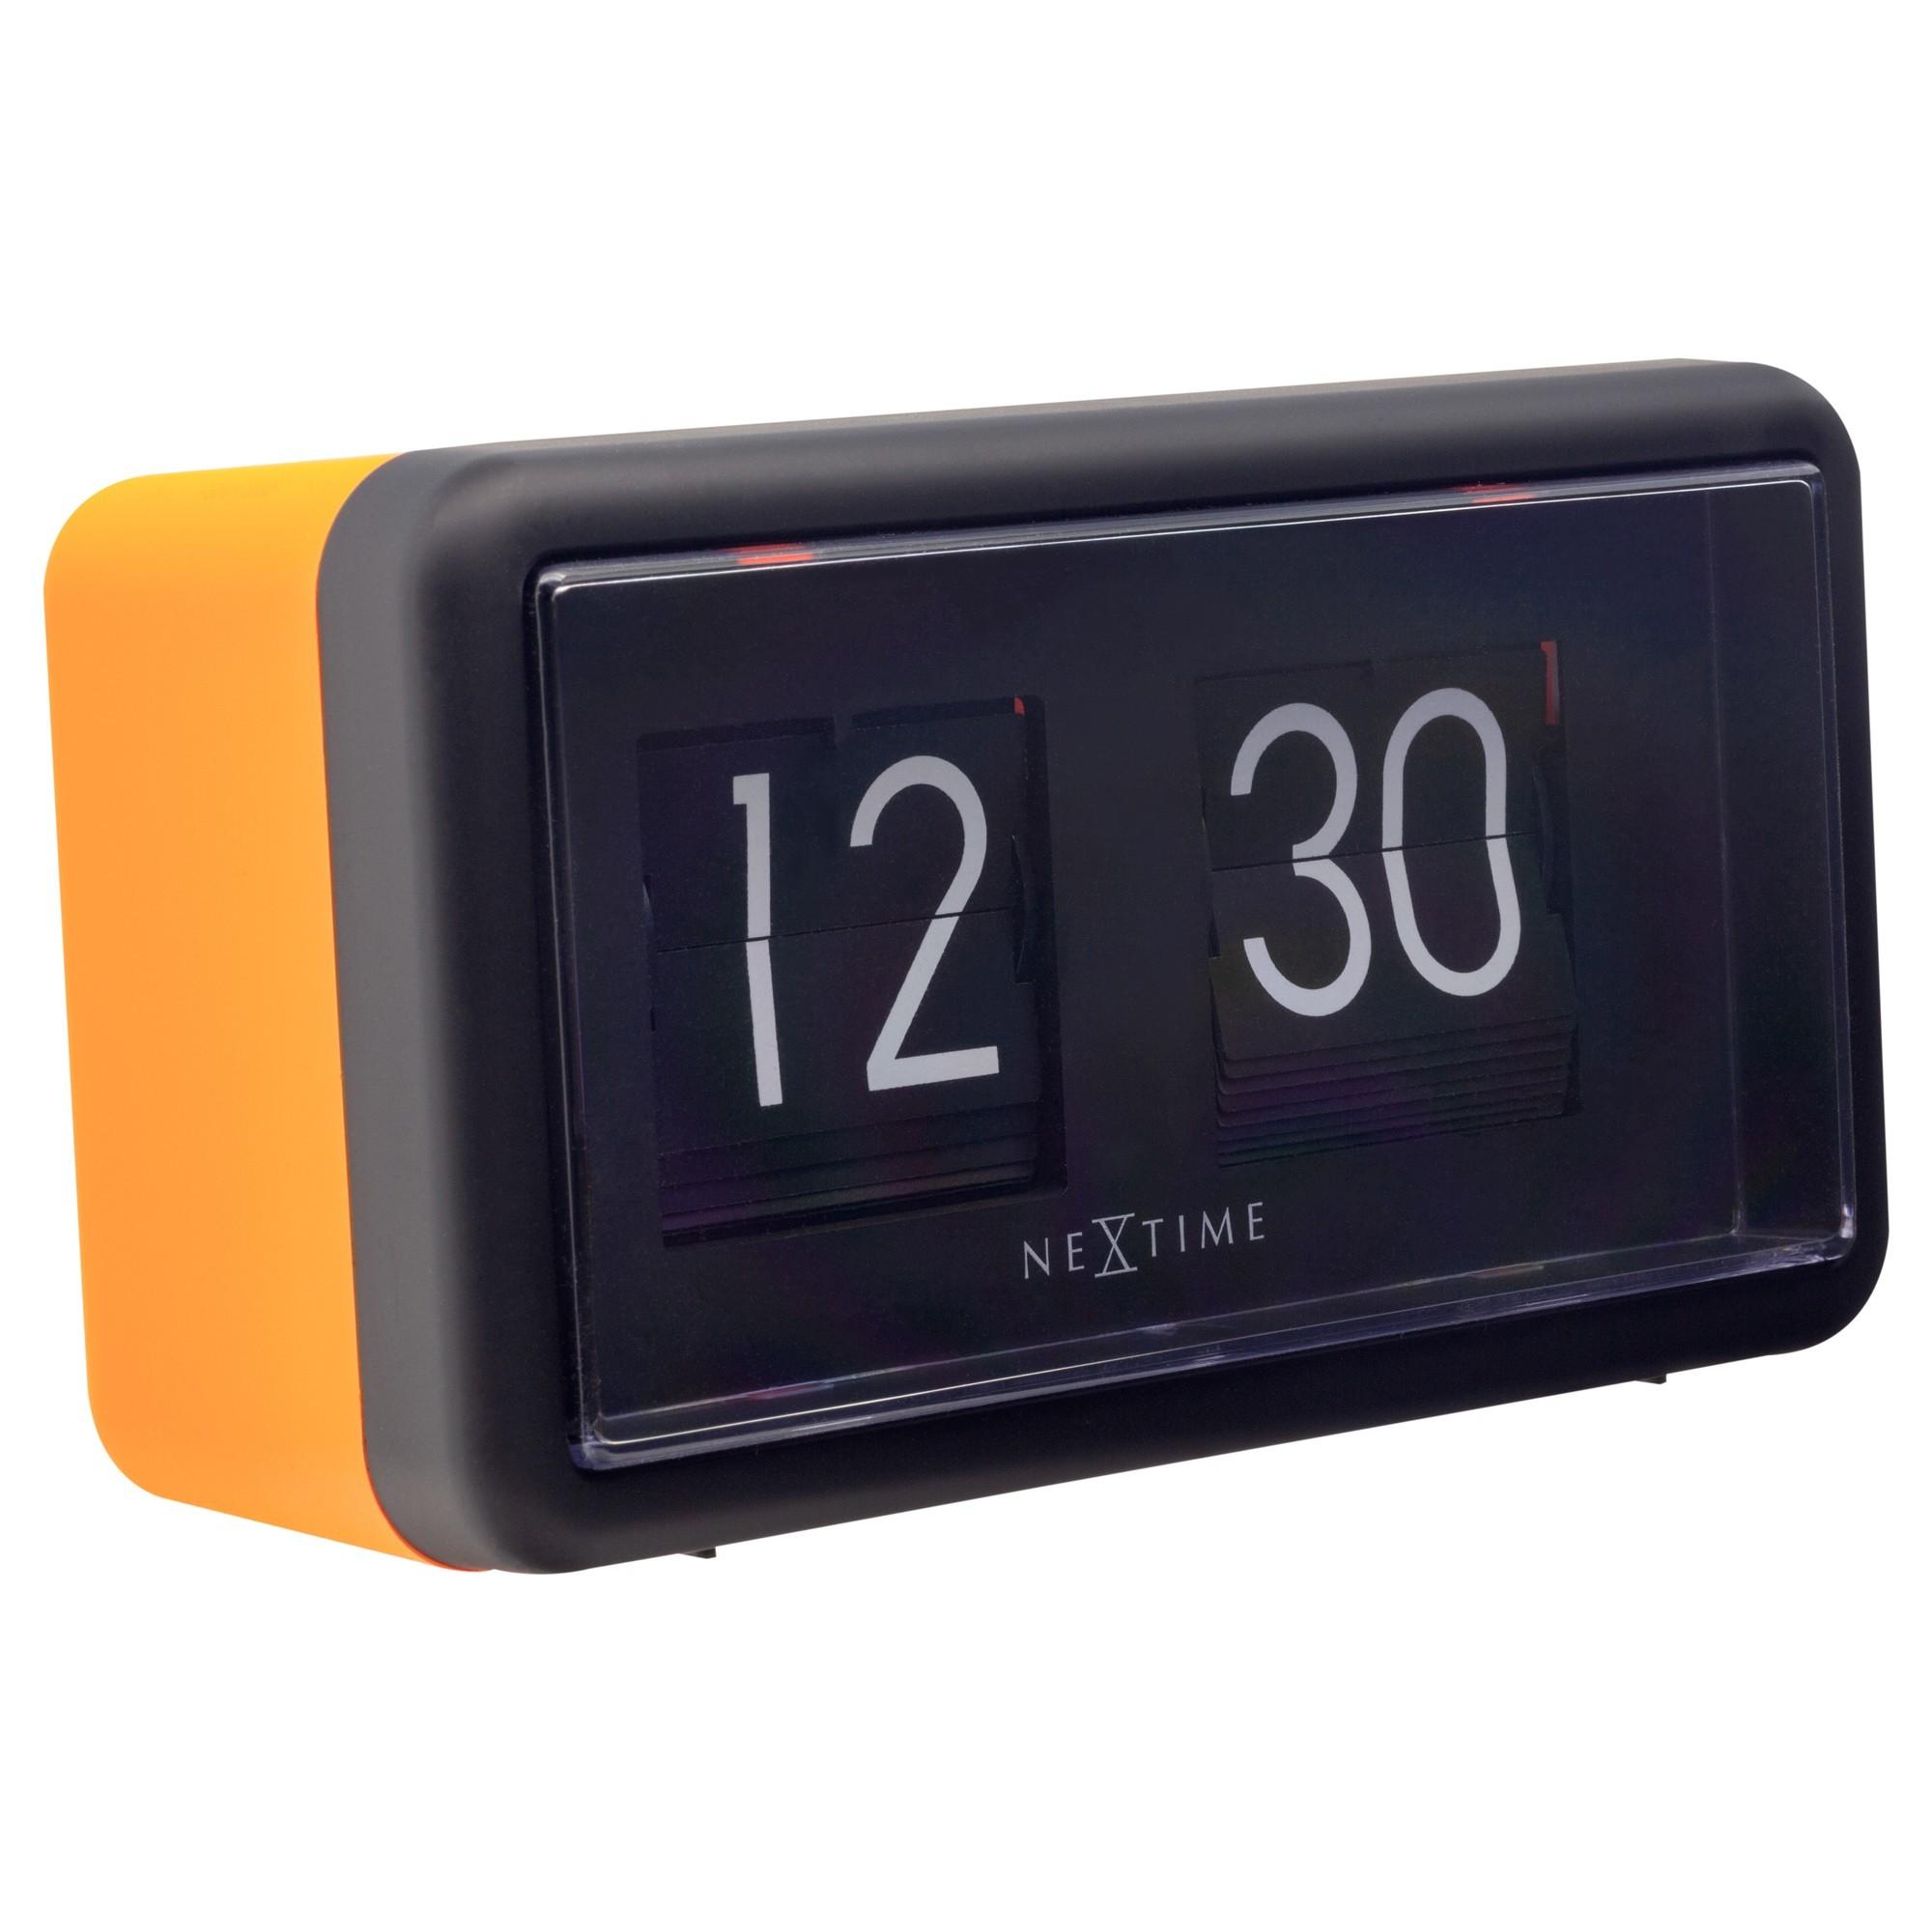 NeXtime Small Flip Wall / Table Clock, 18cm, Black / Orange